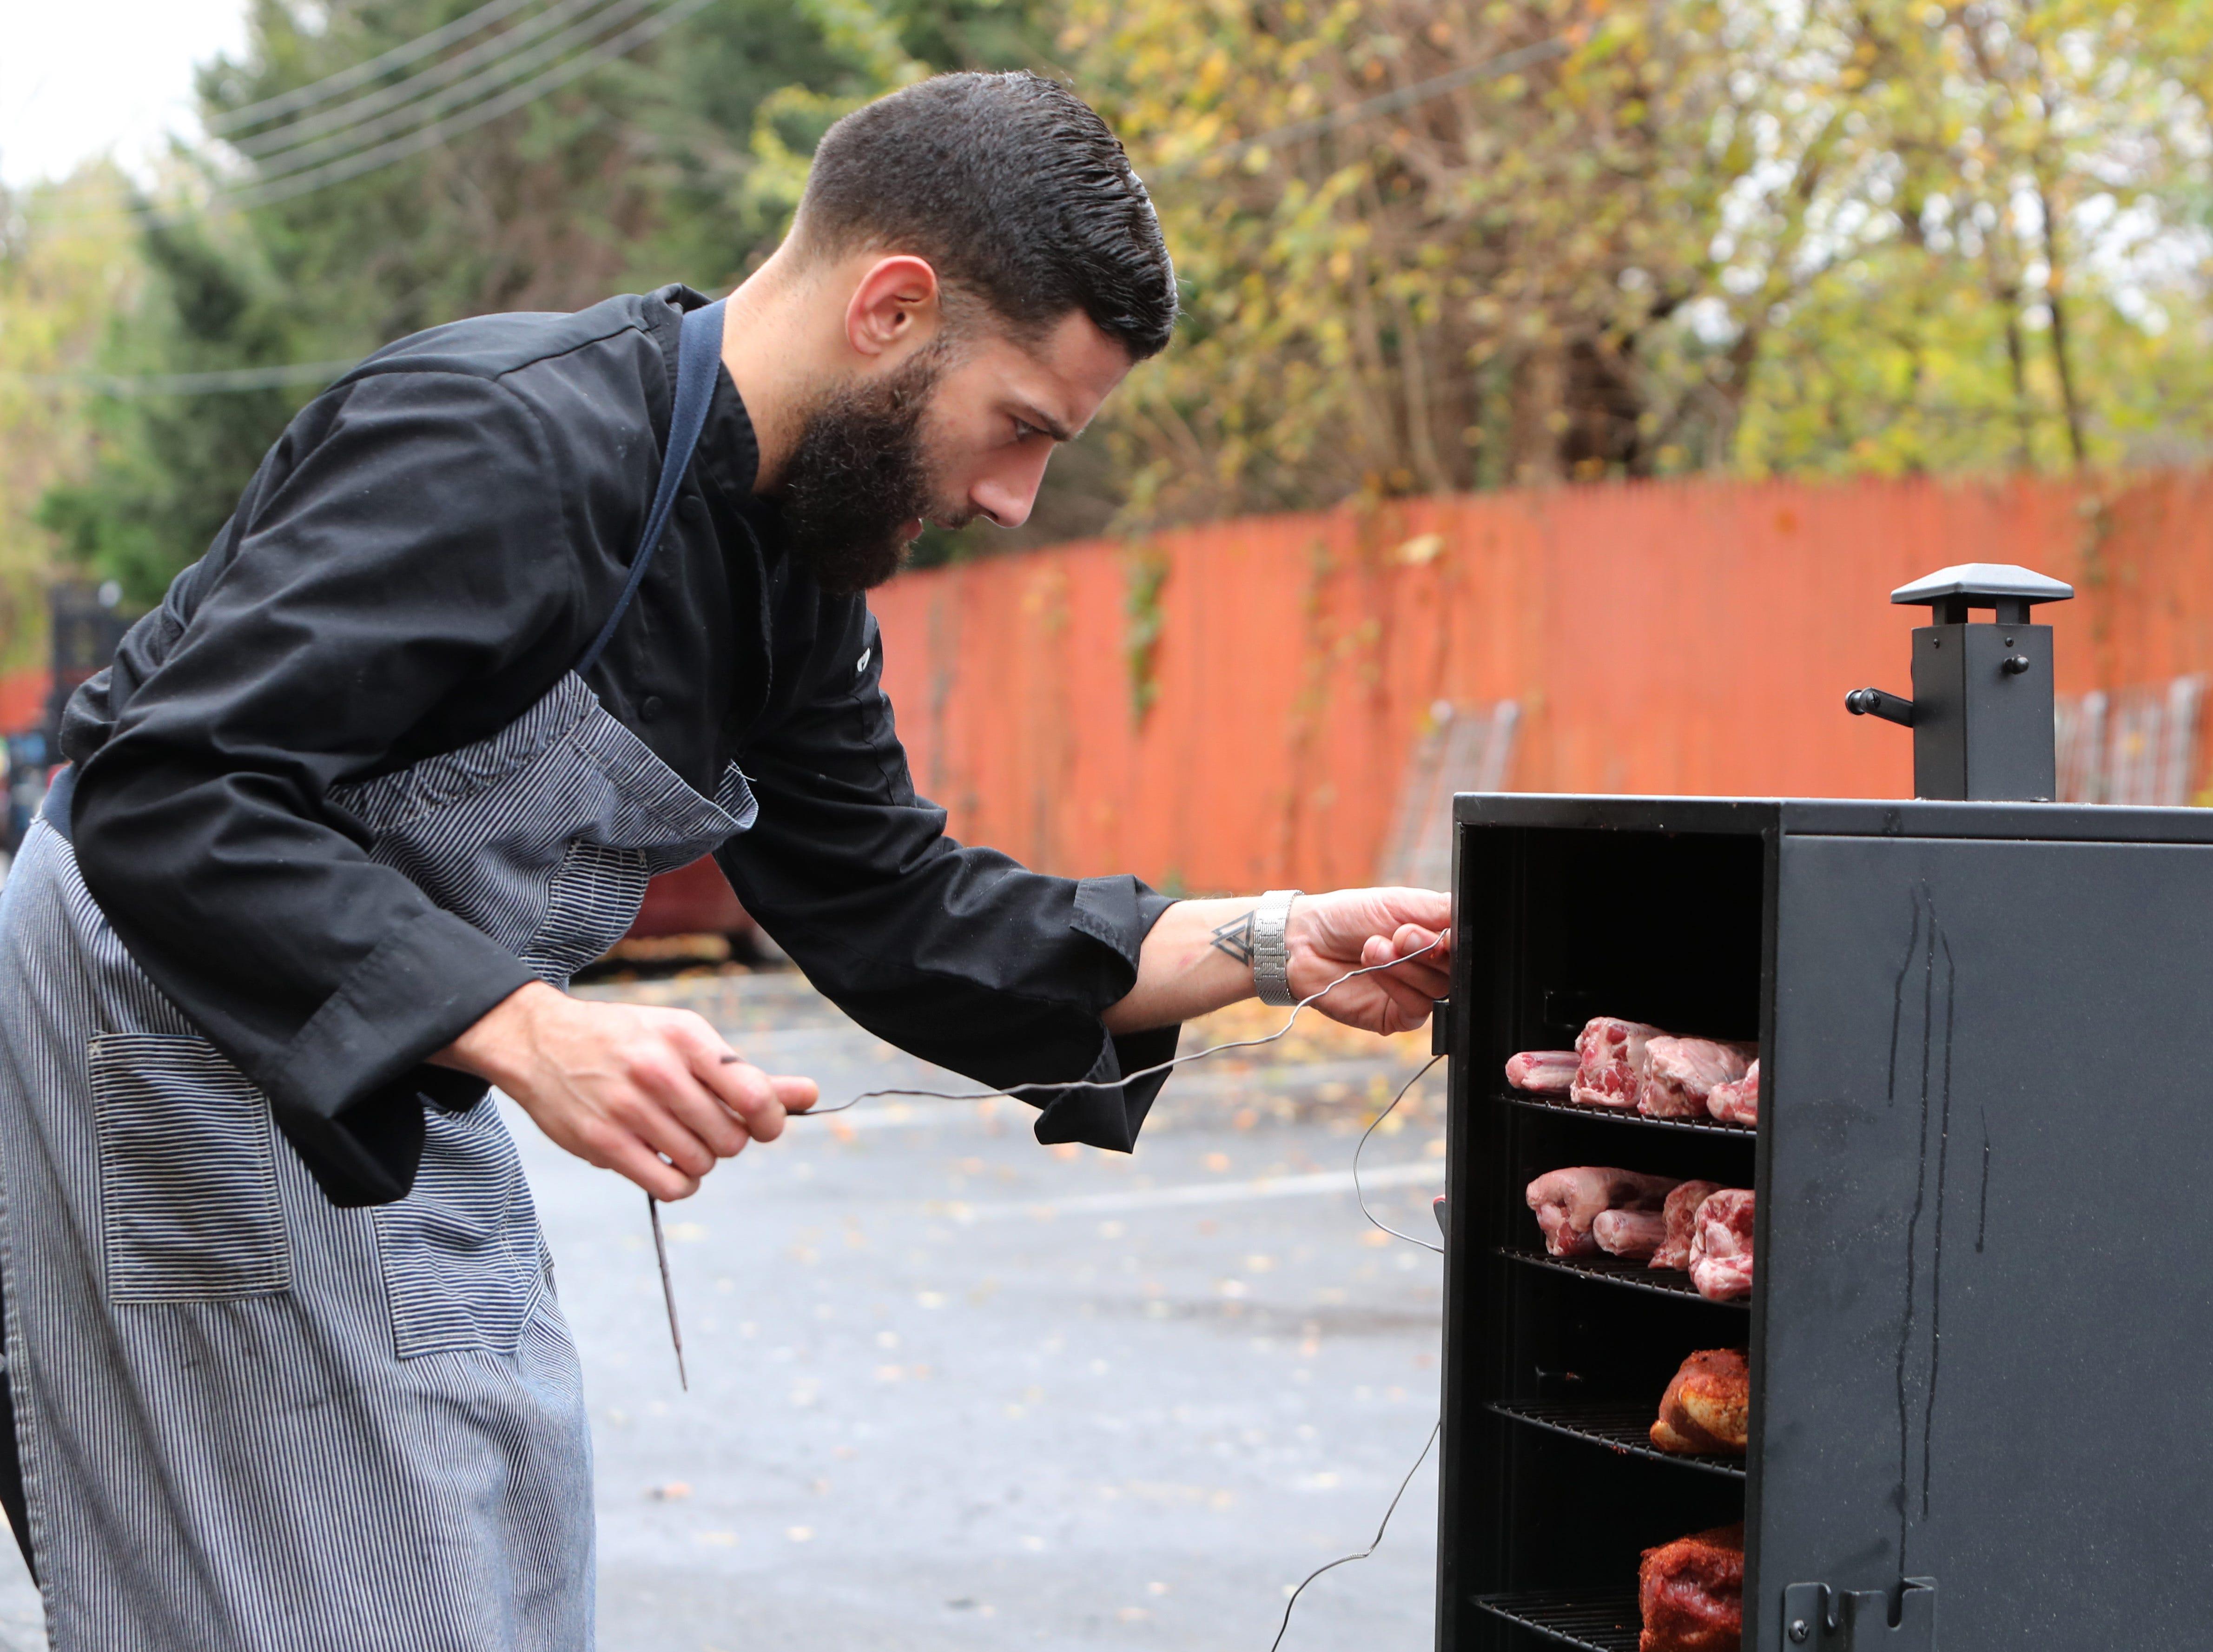 Chef Gustavo Gutierrez loads a smoker at the Ridge Steakhouse in Airmont Nov. 13, 2018.